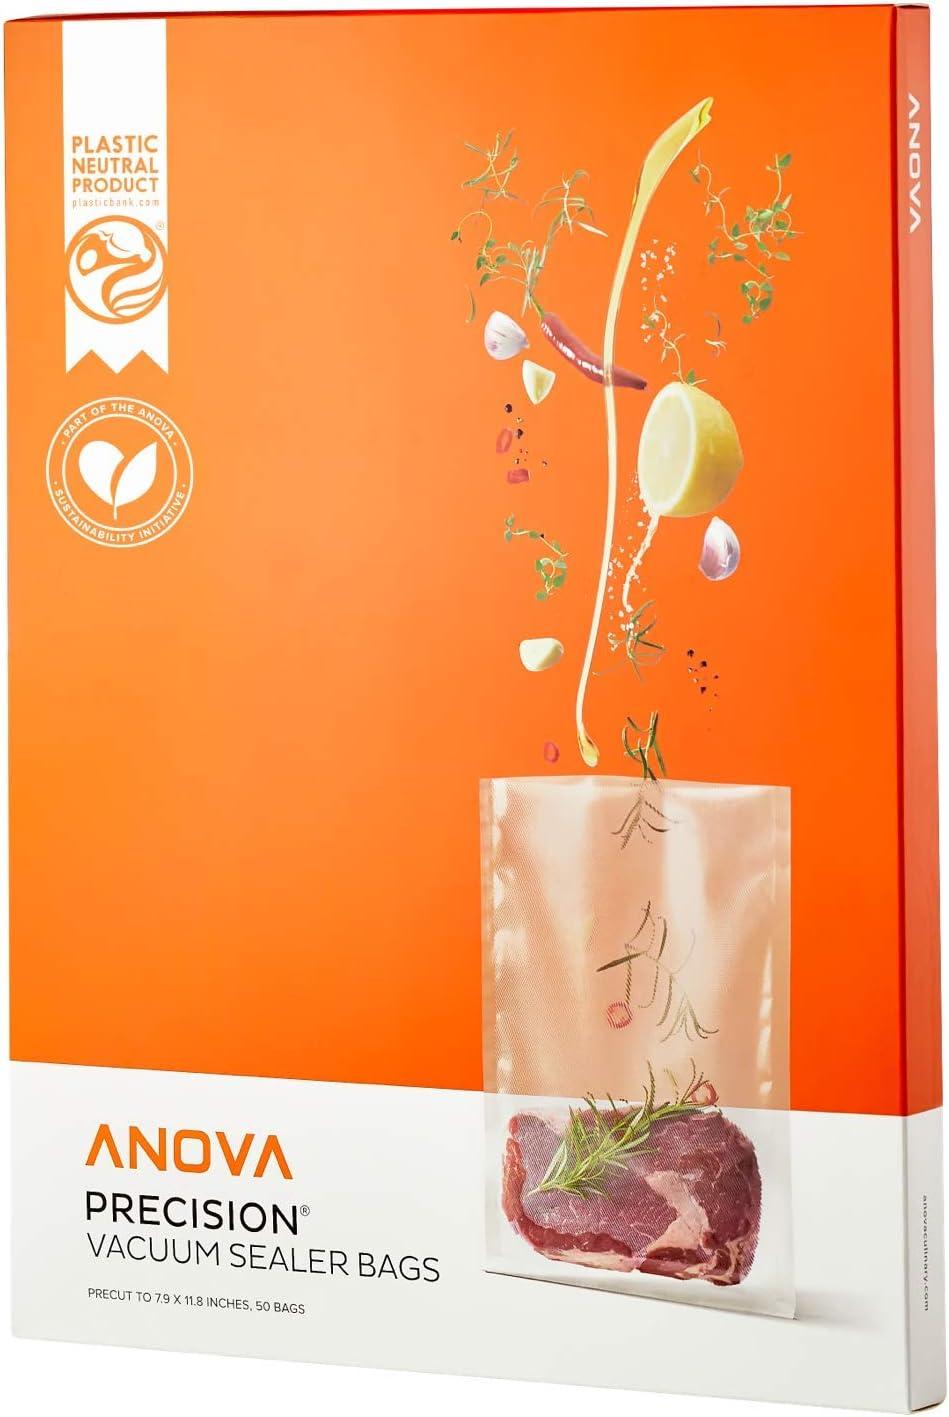 Anova Precision Vacuum Sealer Bags (Pre-cut)